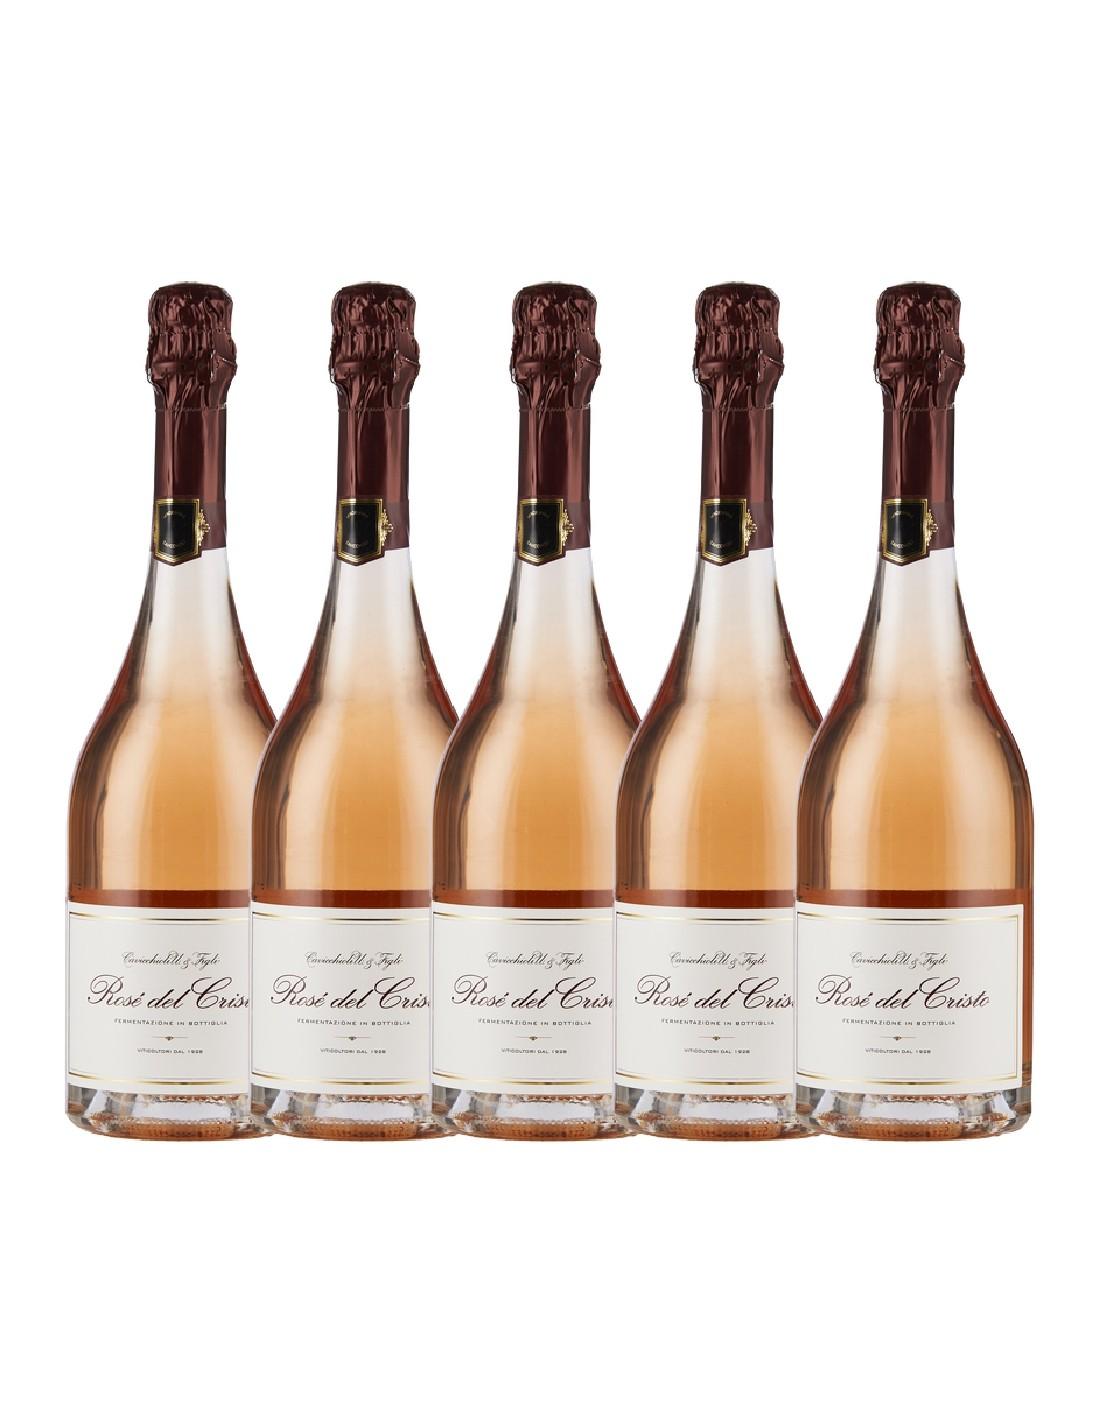 Pachet 5 sticle Vin spumant sec Lambrusco Di Sorbara, Cavicchioli Emilia-Romagna, 0.75L, 11% alc., Italia